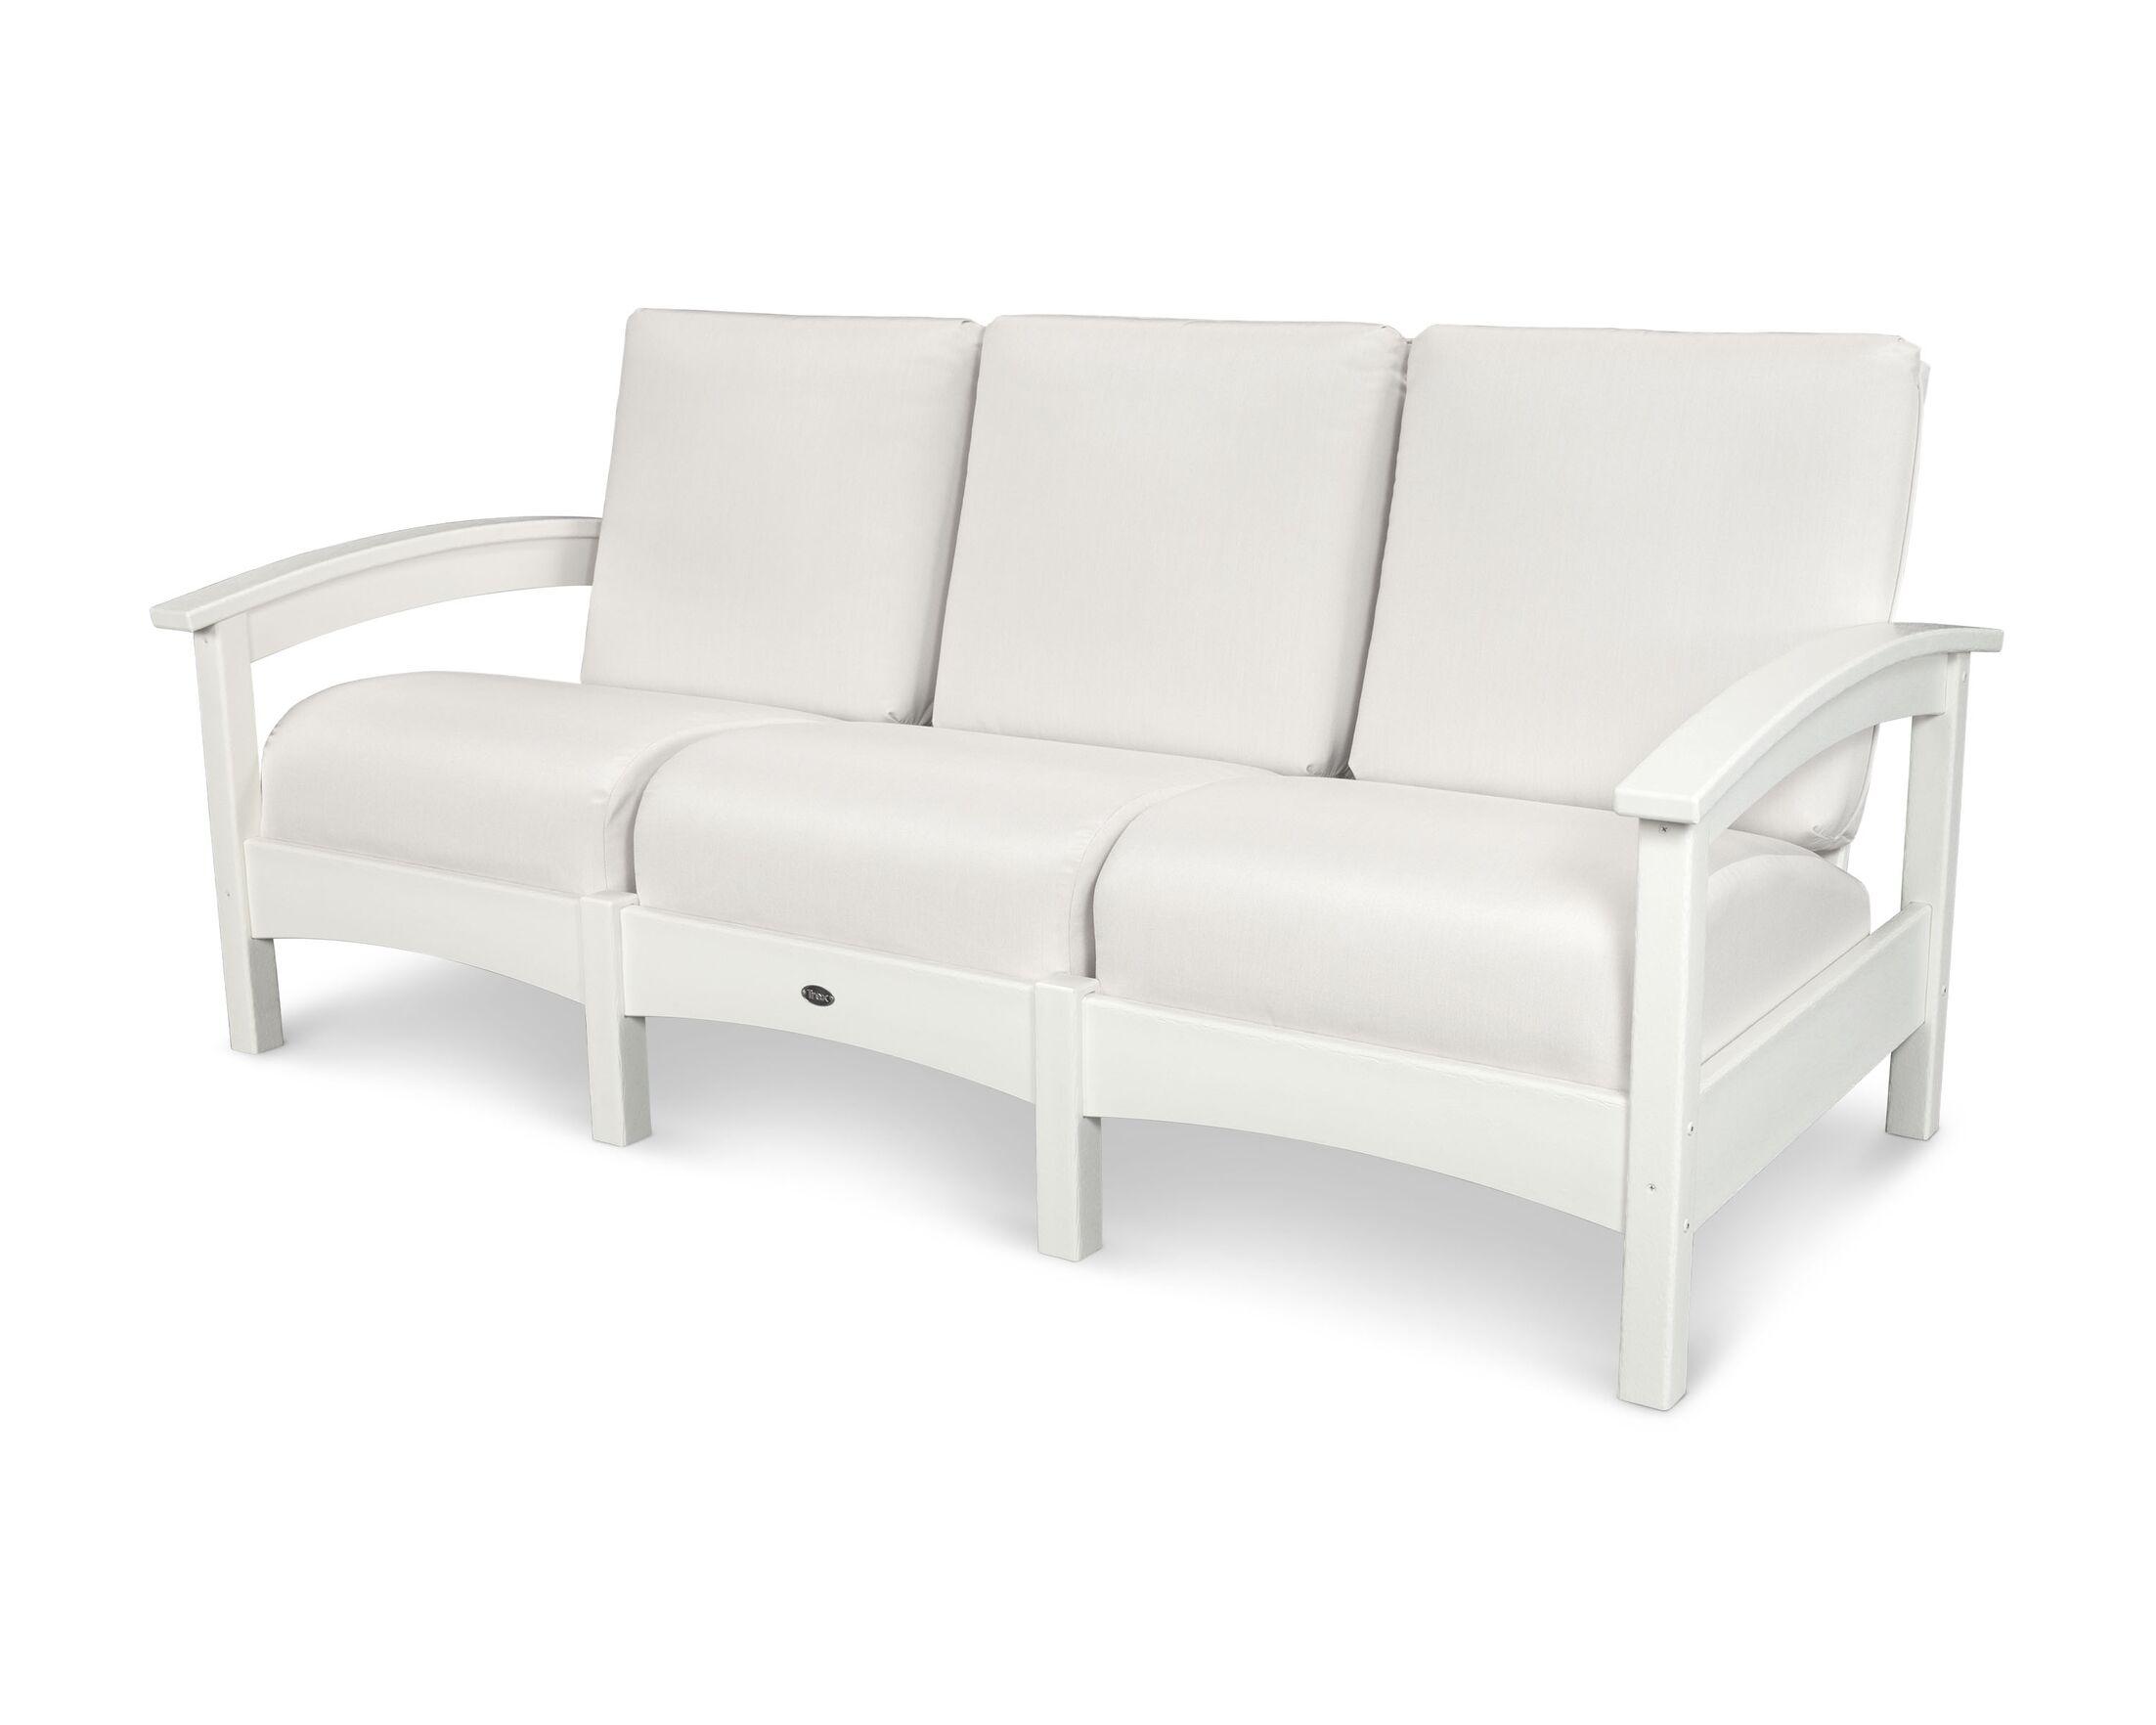 Rockport Club Sofa Color: Classic White / Bird's Eye